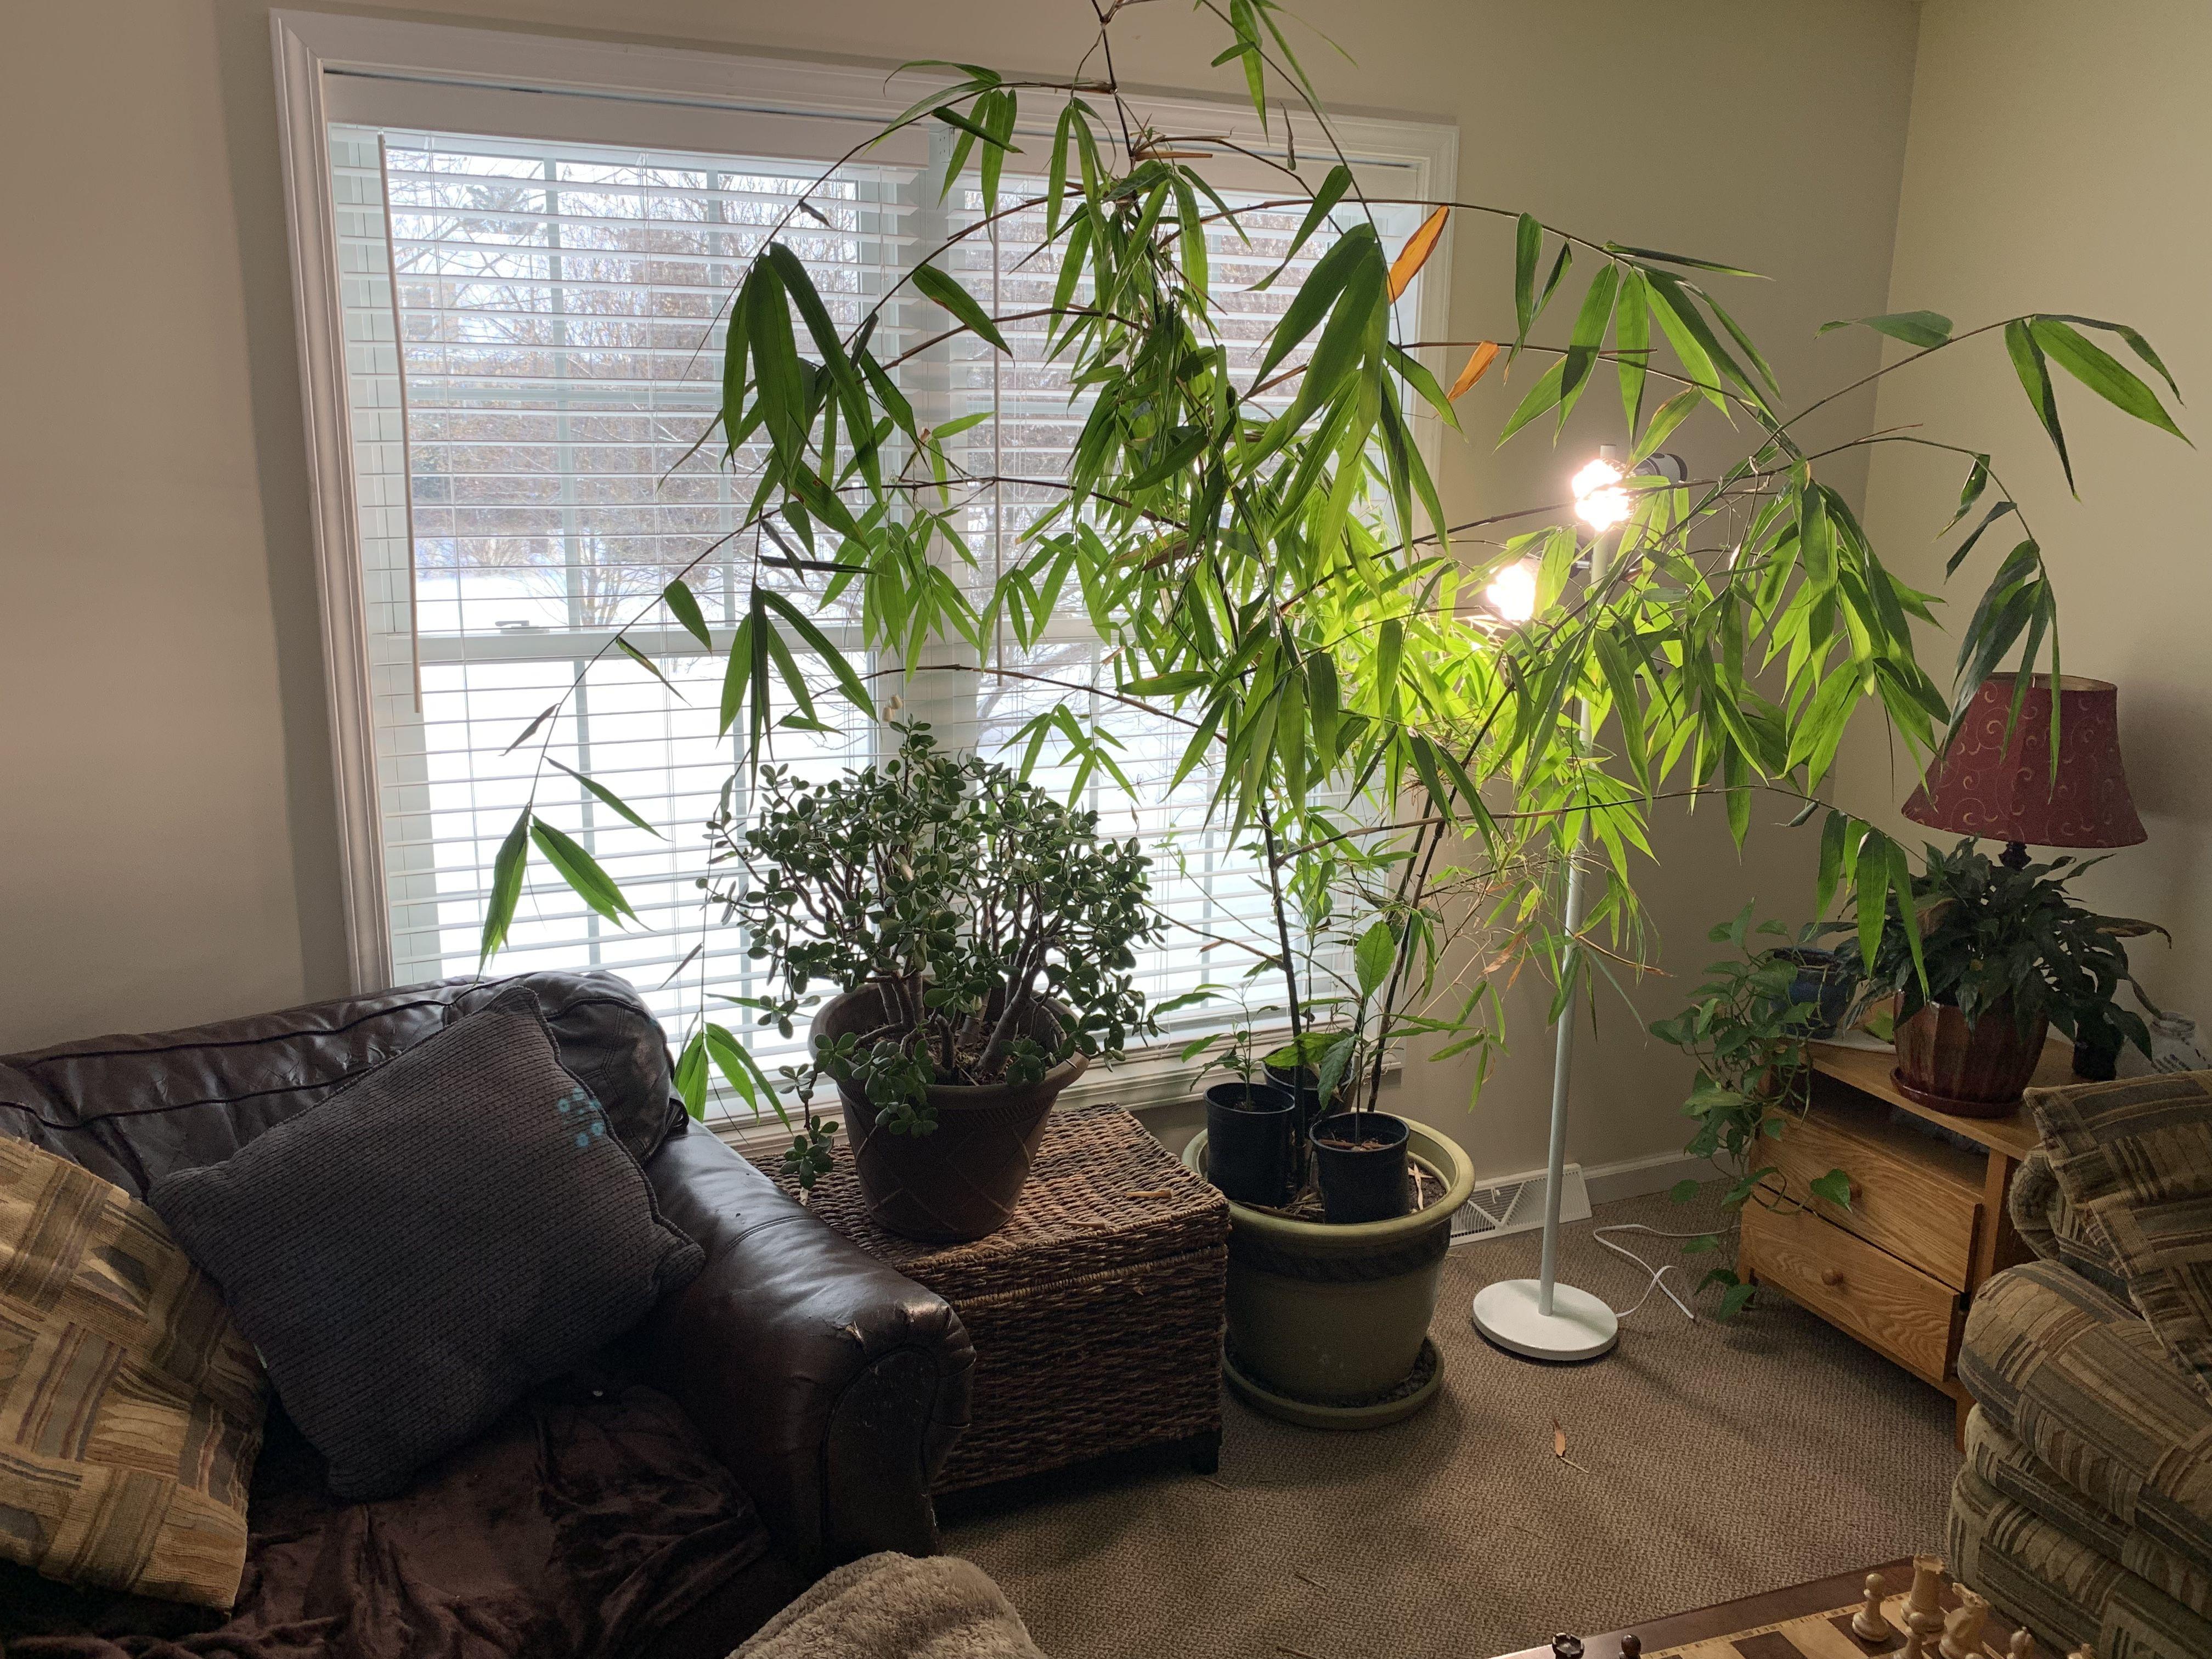 Sansi Led Security Lights Led Bulbs Grow Lights Grow